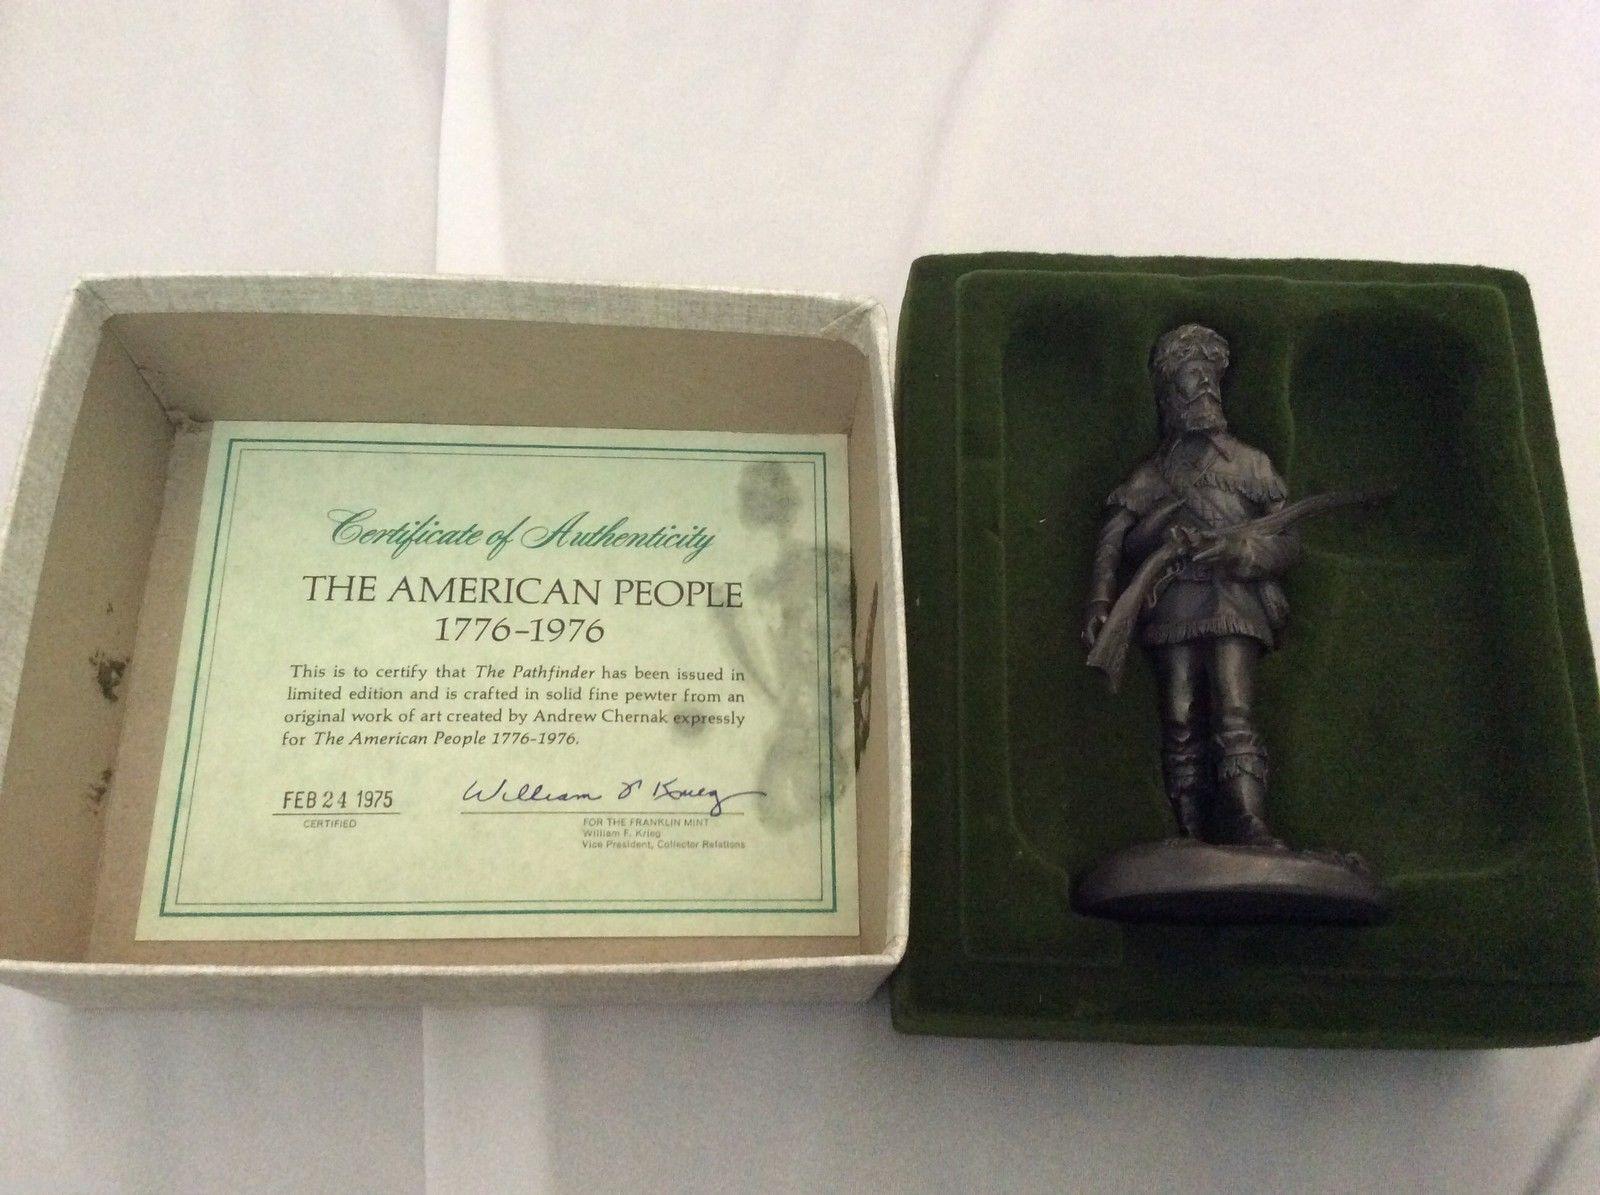 THE PATHFINDER AMERICAN PEOPLE 1776-1976 FRANKLIN MINT FINE PEWTER FIGURINE